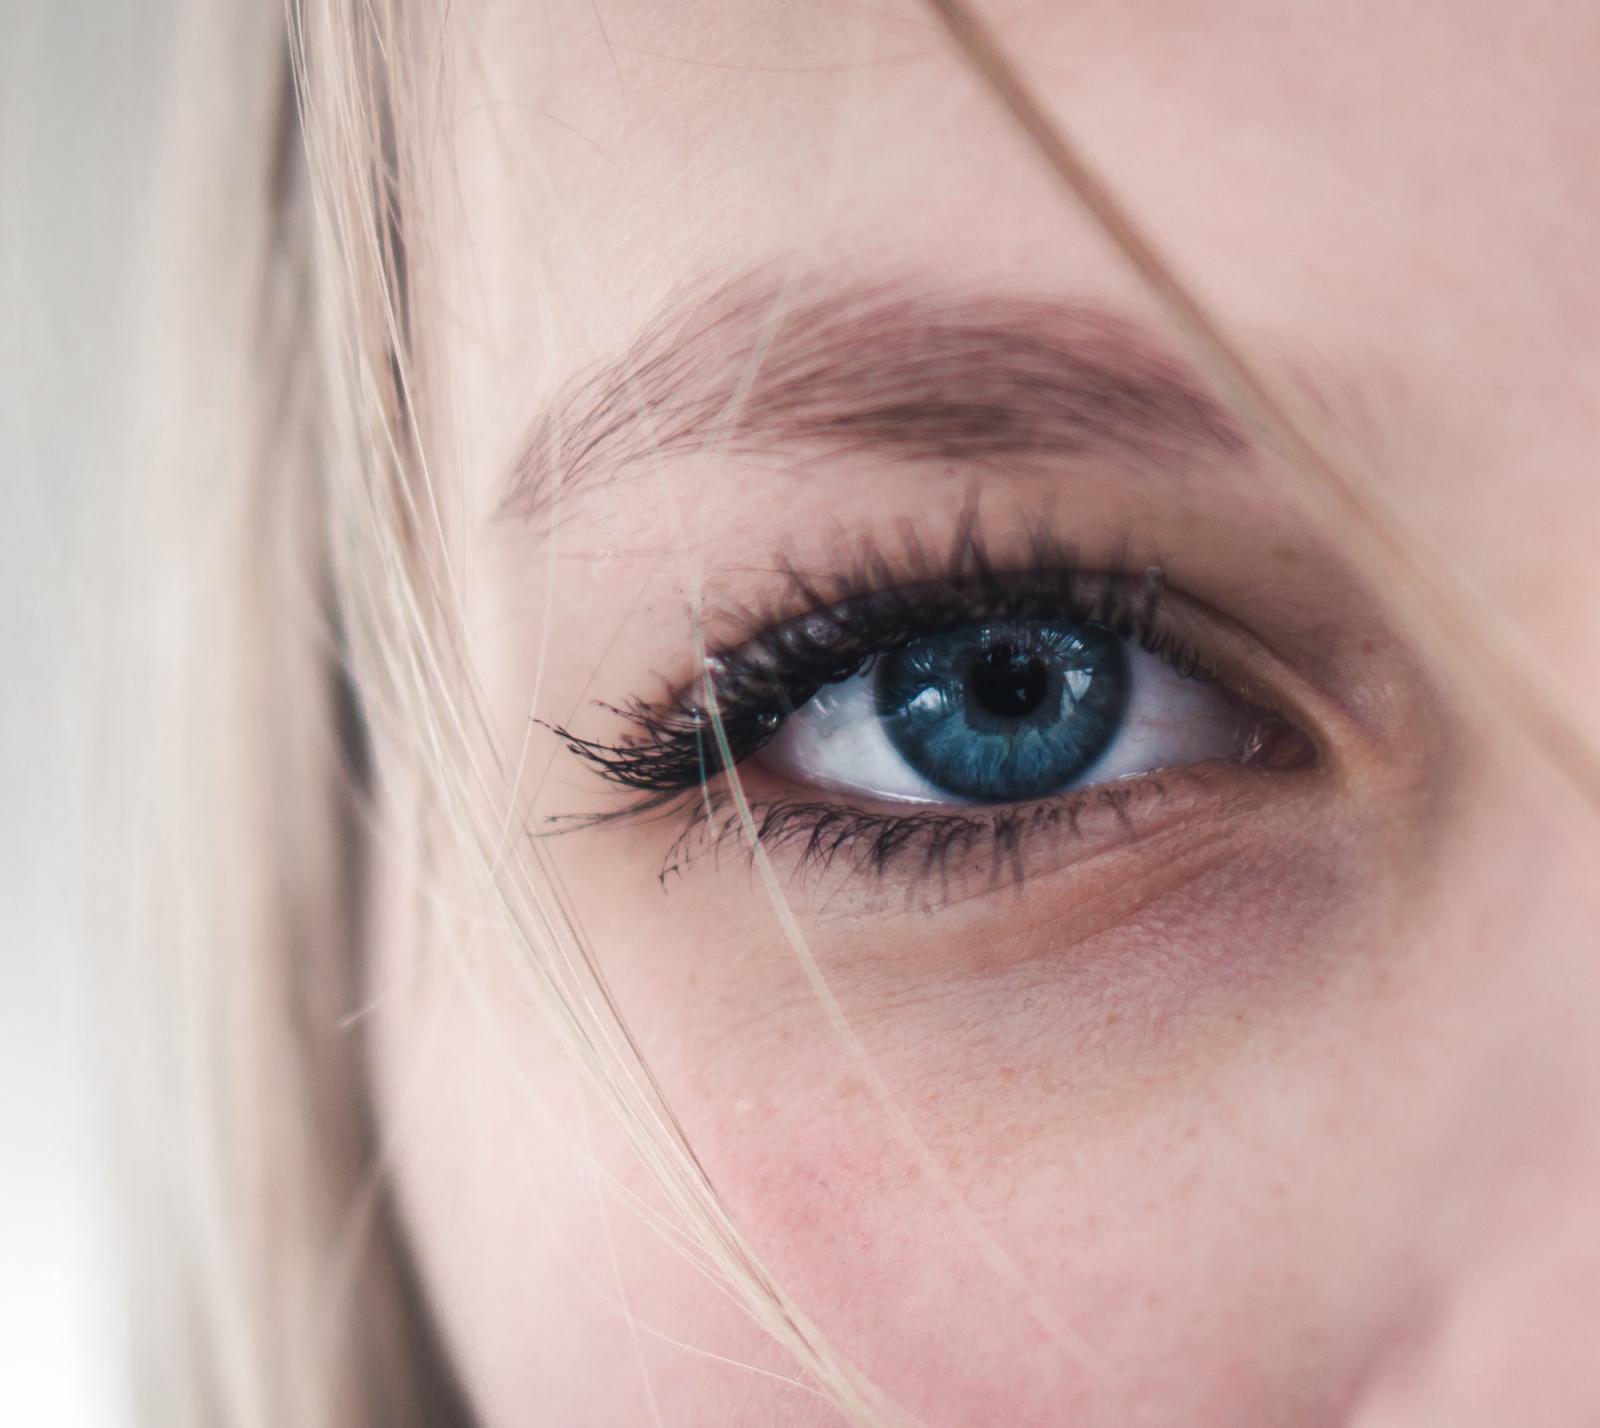 Babor-Skinovage-PX-Sensational-Eyes-Reactivating-Eye-Cream-abloomnova.net_-1600x1428 Does eye cream work?